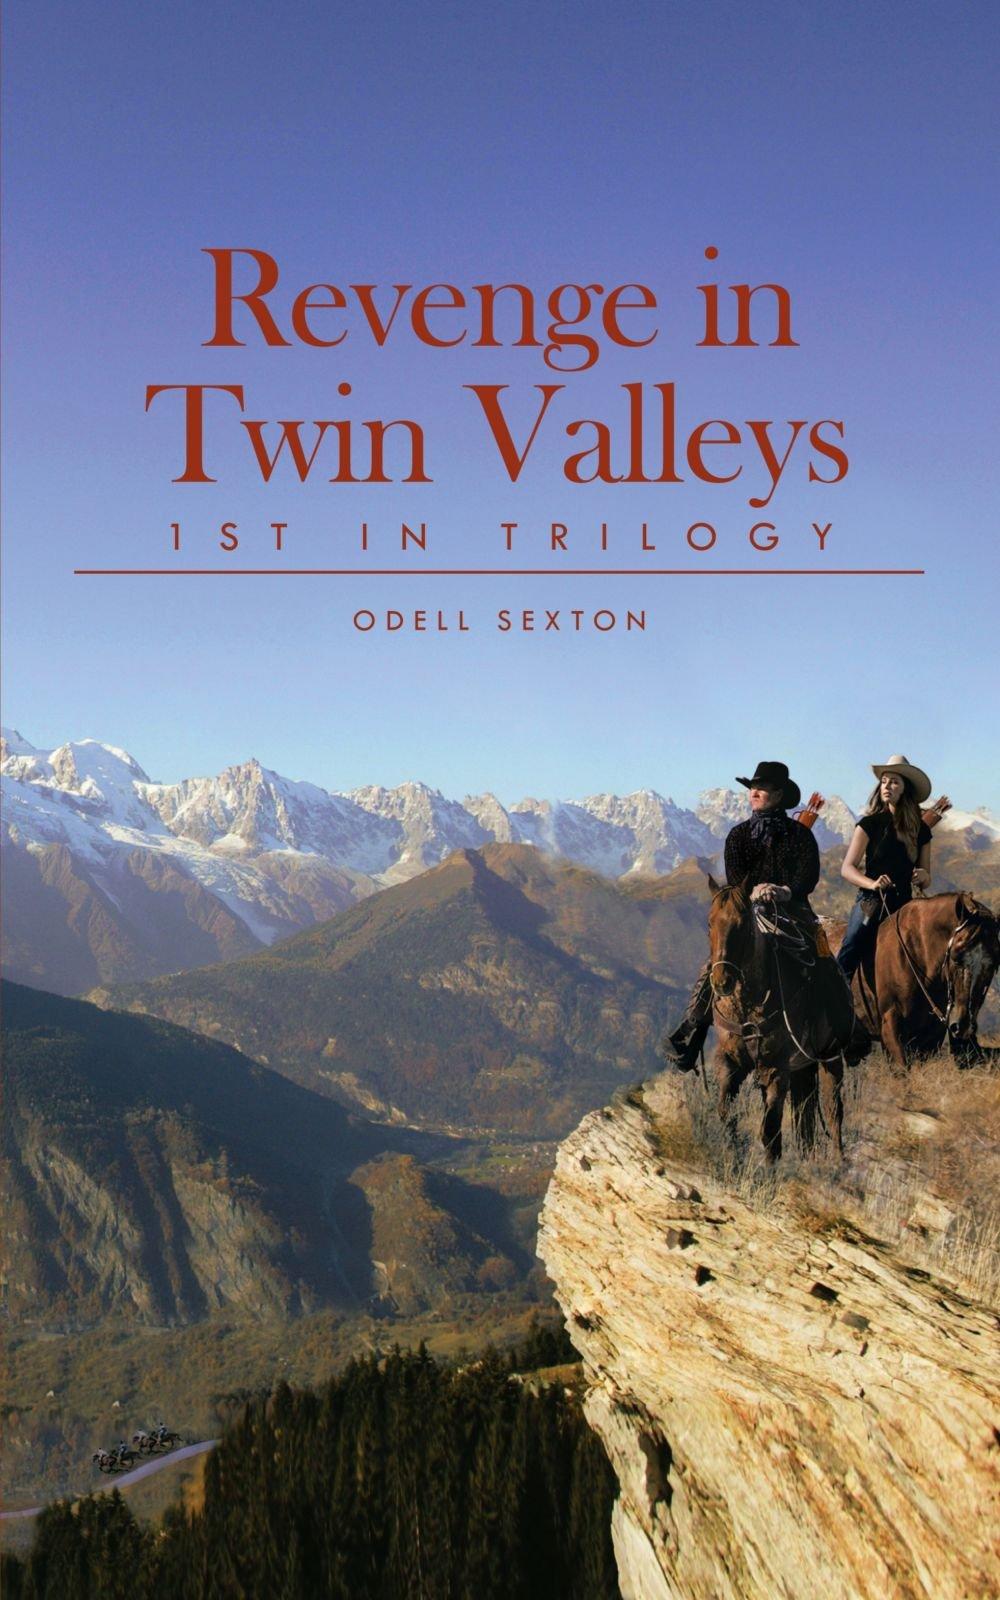 Download Revenge in Twin Valleys: 1st in Trilogy ebook